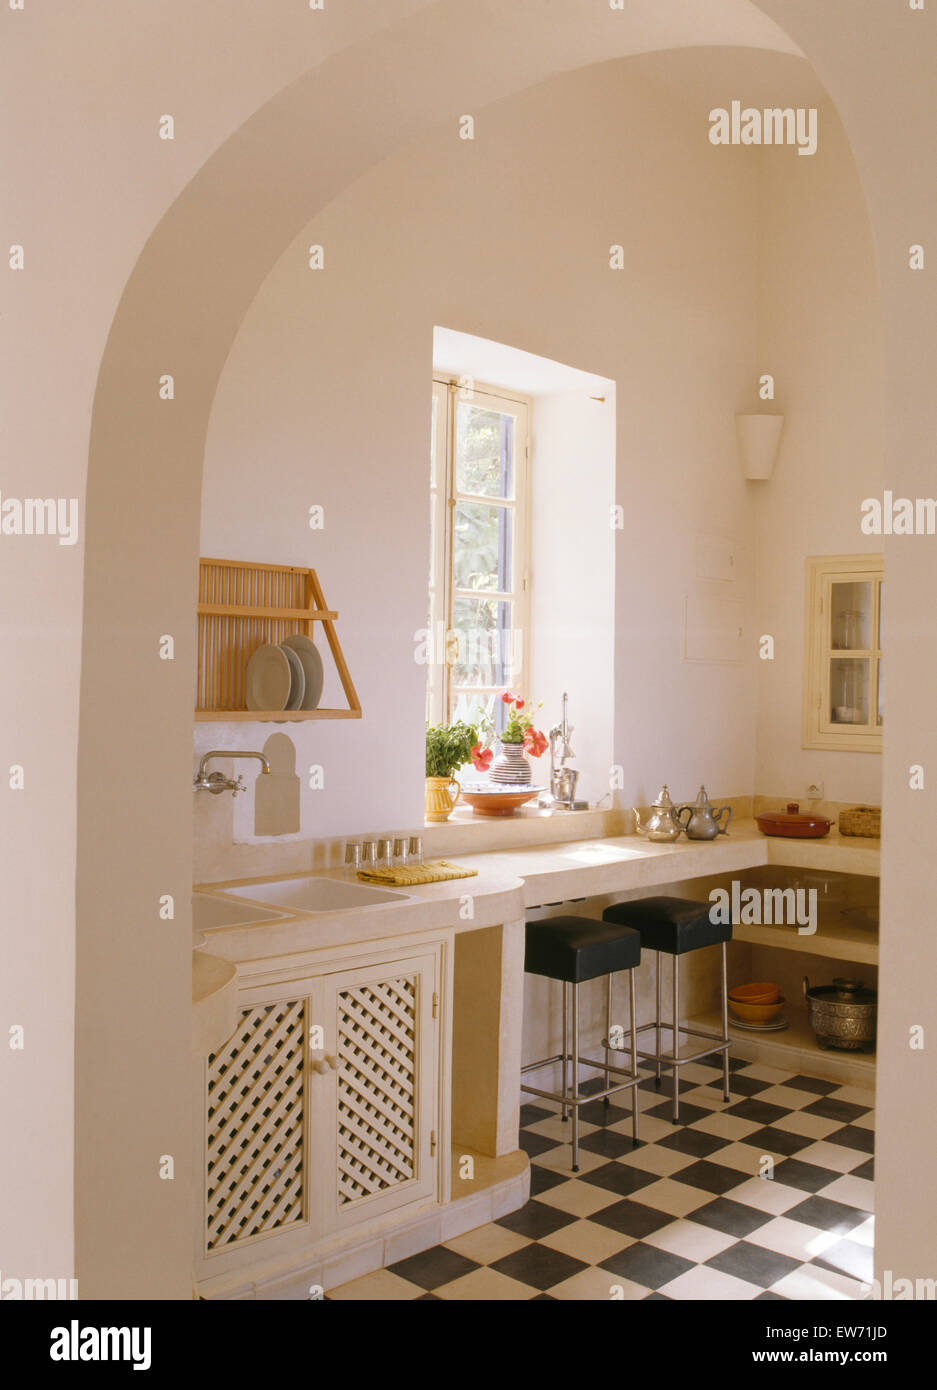 Black And White Checkerboard Kitchen Ideas Html on black and white kitchen floor rug, black and white checkered canister sets, black and white tile kitchen floor, black and white kitchen designs,